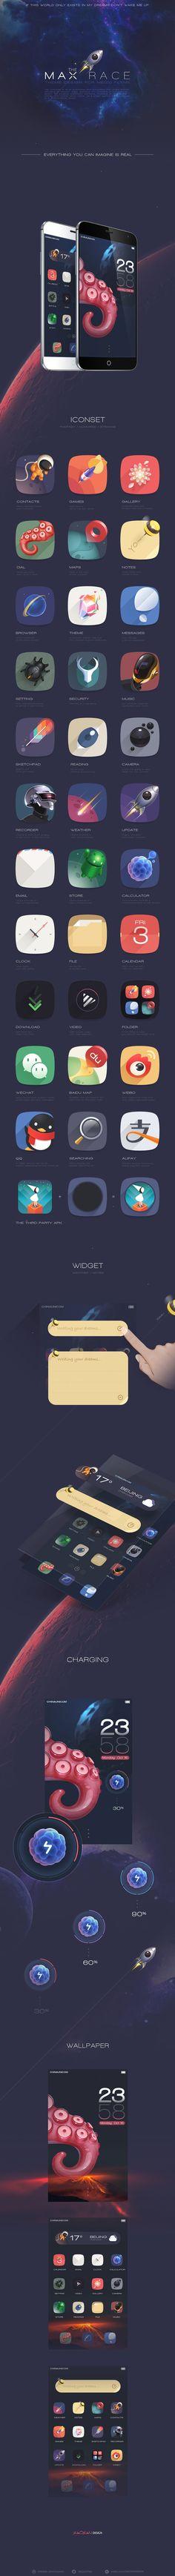 Beautiful case study on icons and UI… Game Ui Design, Ux Design, Icon Design, Creative Design, Application Design, Mobile Application, Material Design, Conception D'applications, Applications Mobiles